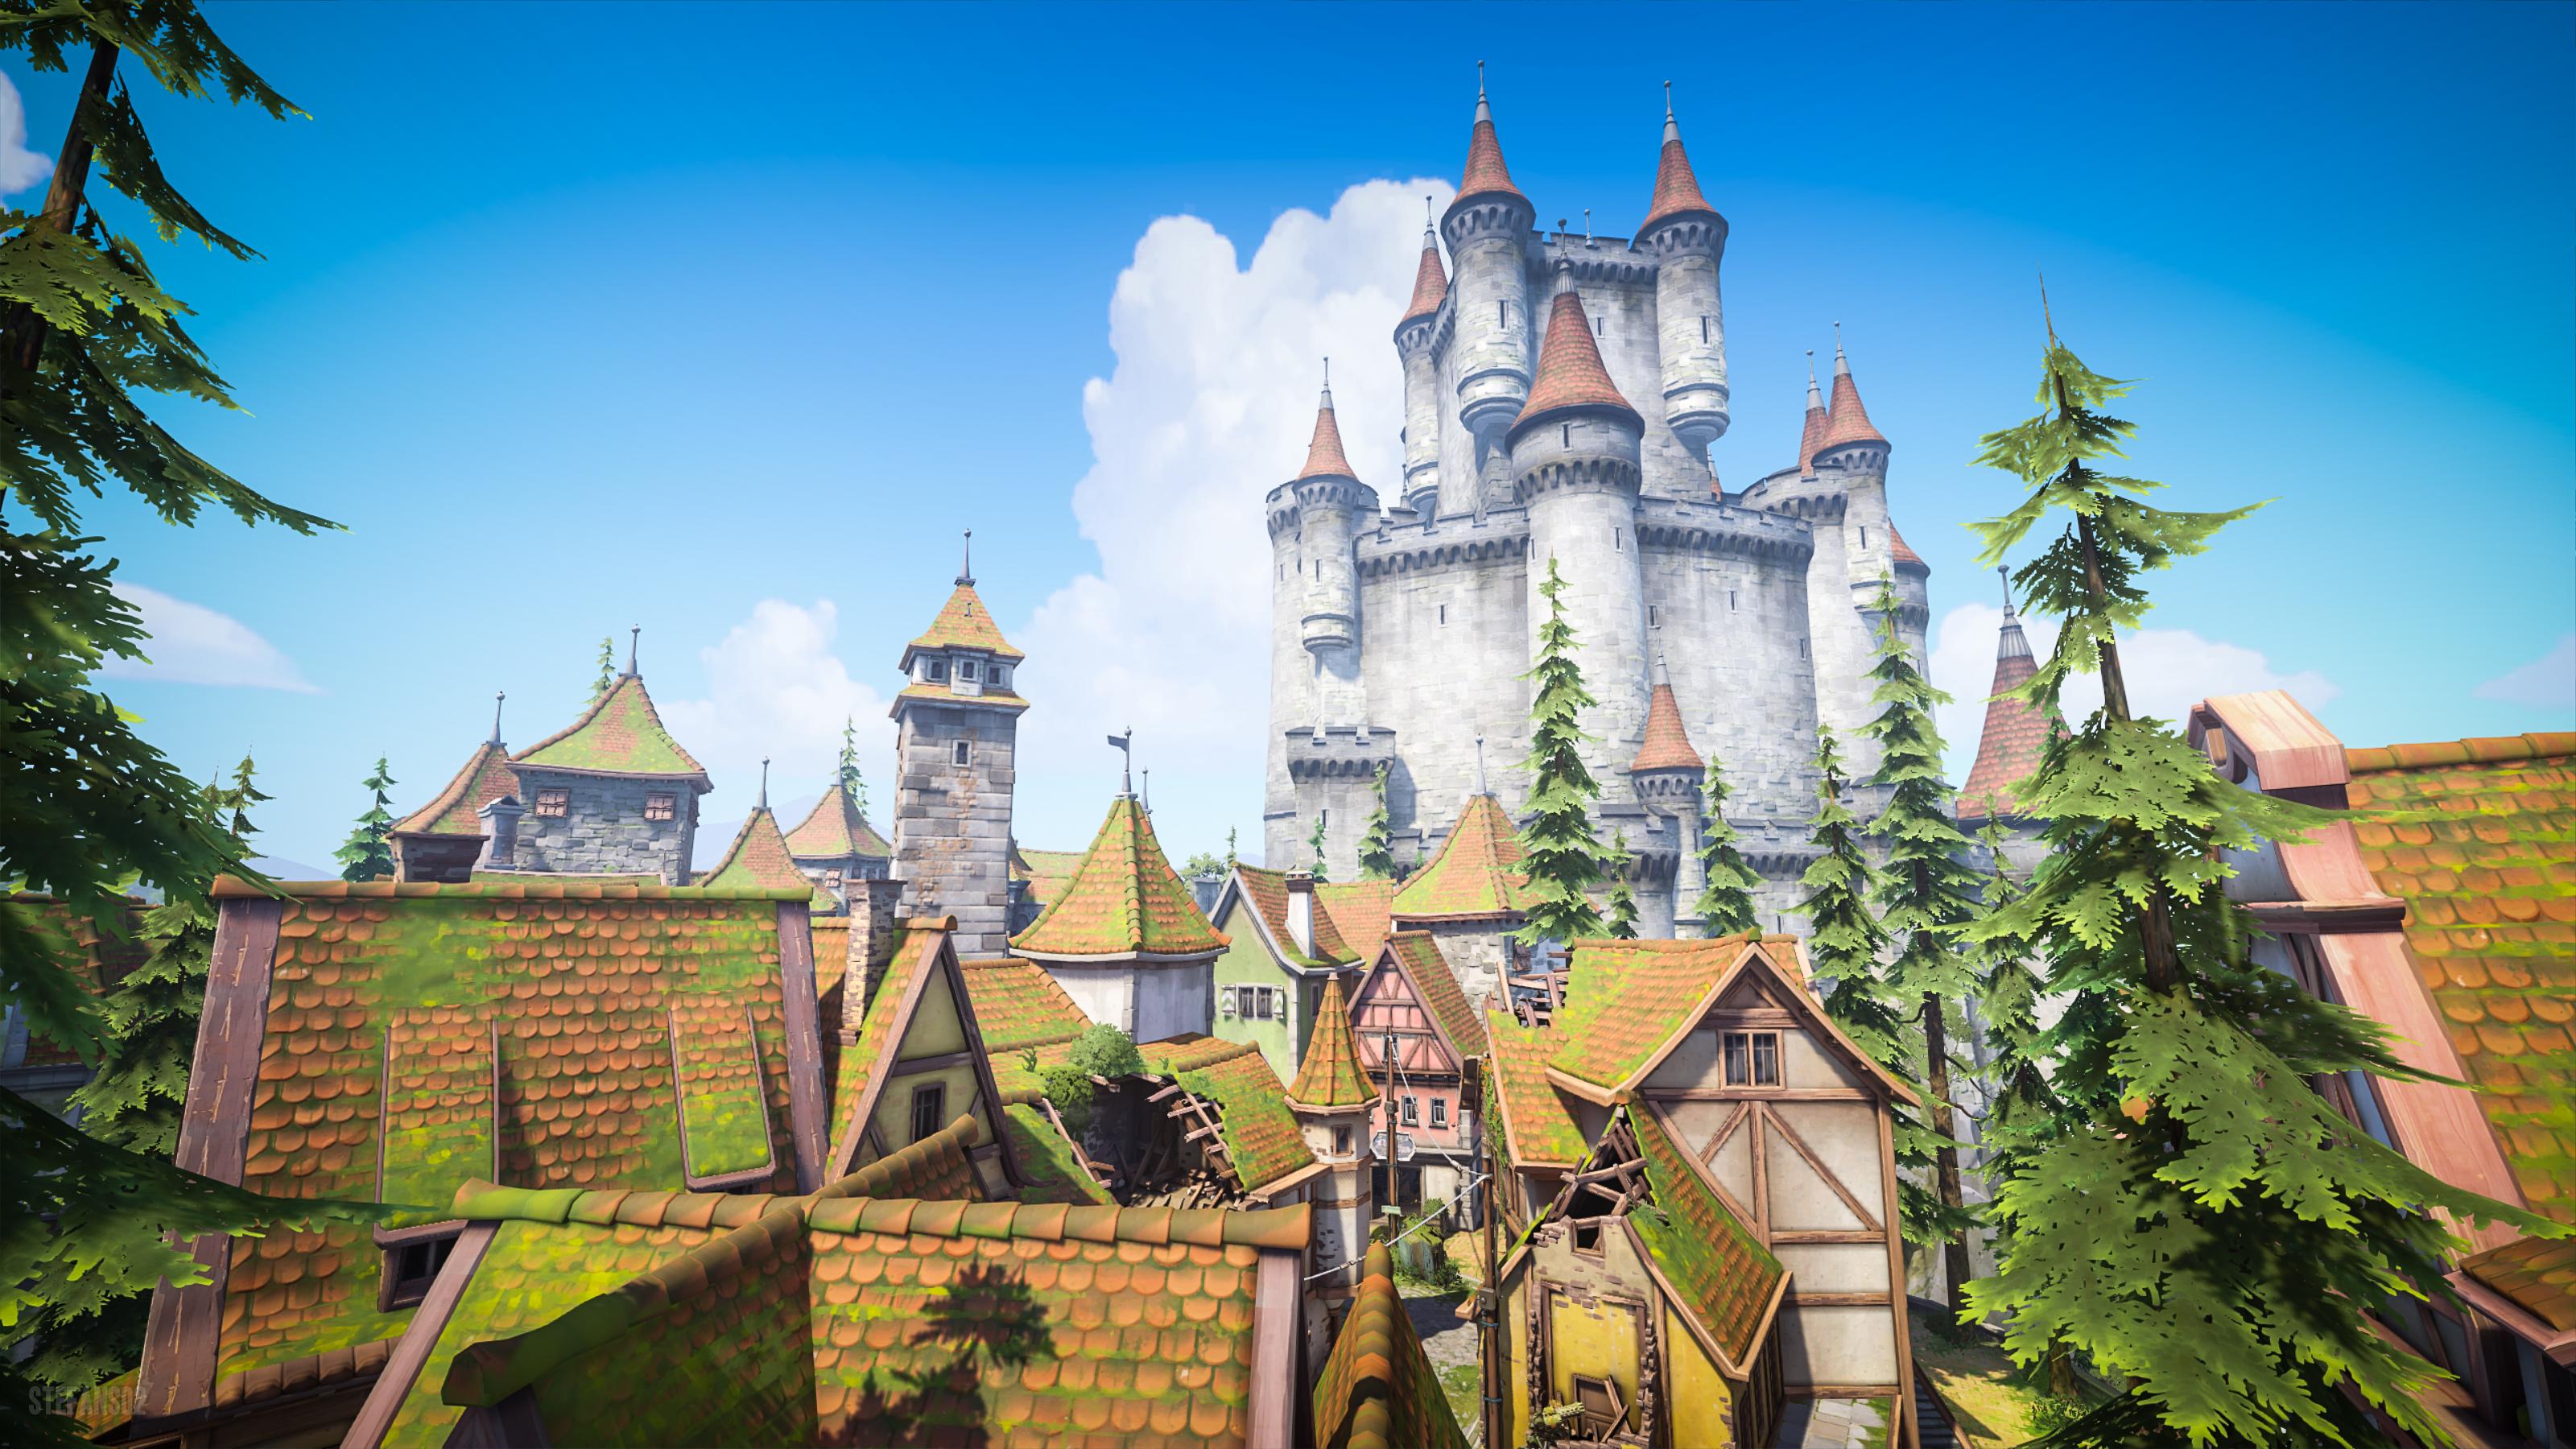 Overwatch World Fond Ecran Chateau Fort Jeux Video Info